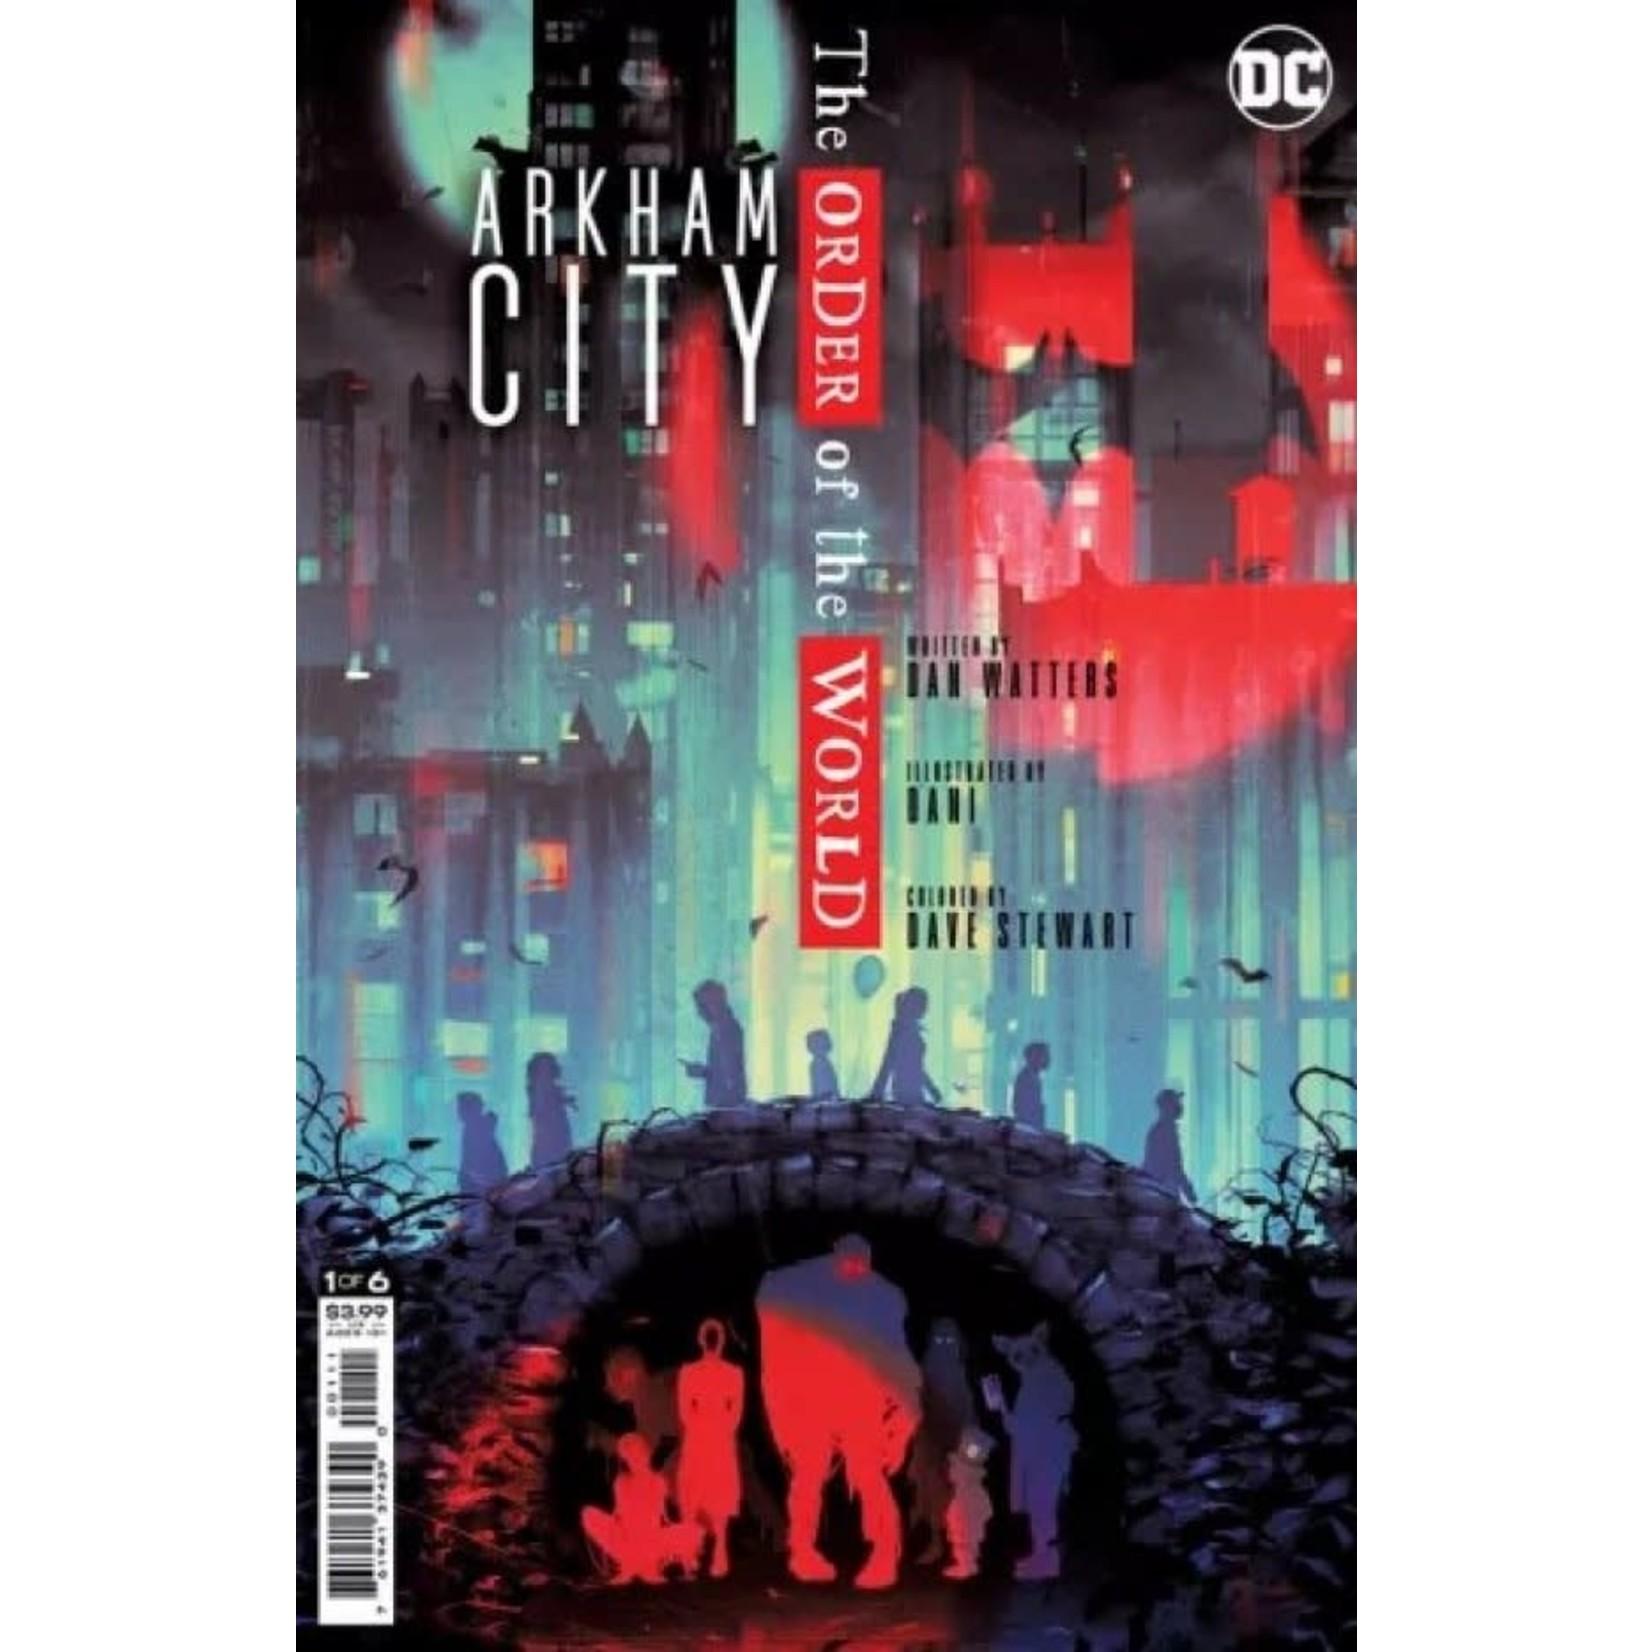 DC Comics Arkham City: The Order of the World #1